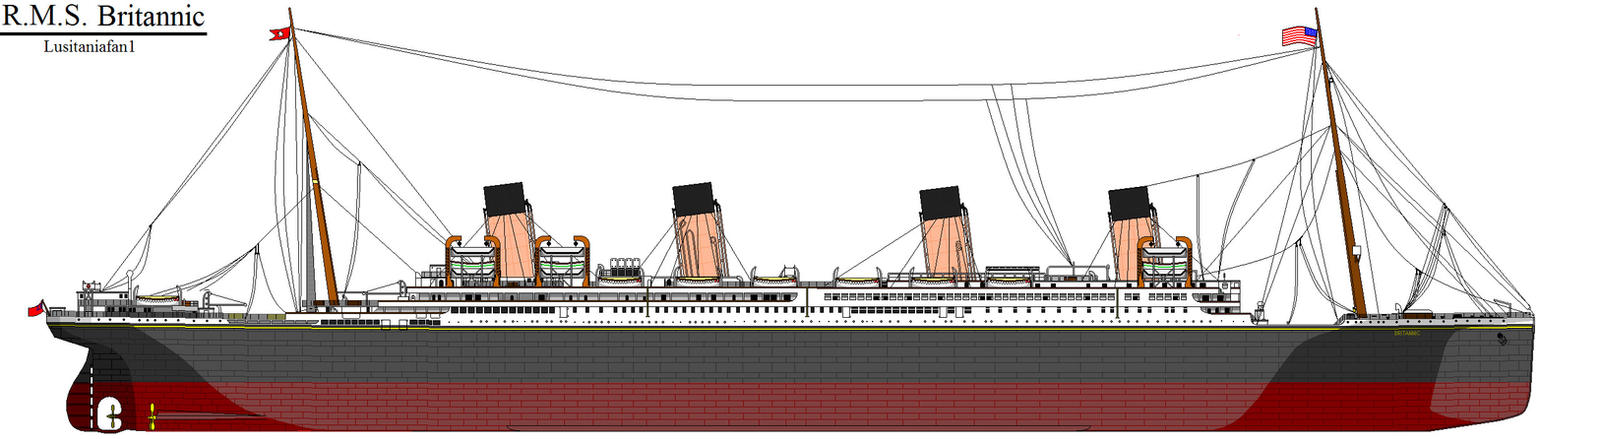 RMS Britannic by Lusitaniafan1 on DeviantArt